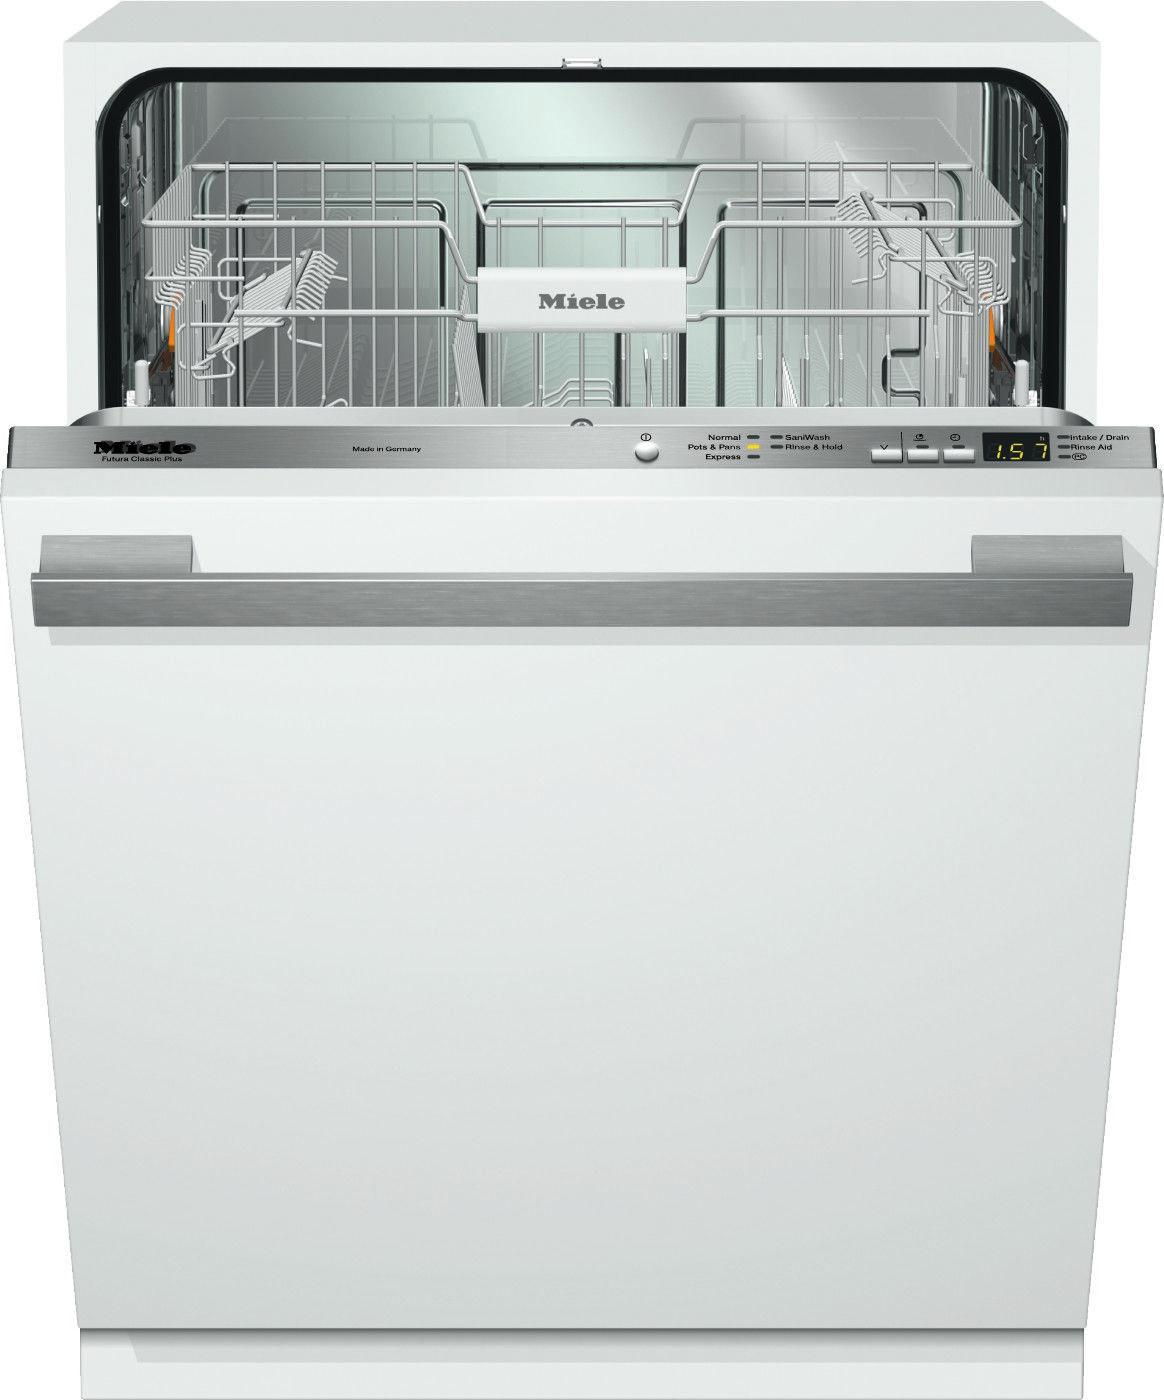 Miele G 4975 Vi Classic Plus Dishwasher Built In Dishwasher Integrated Dishwasher Basket Design